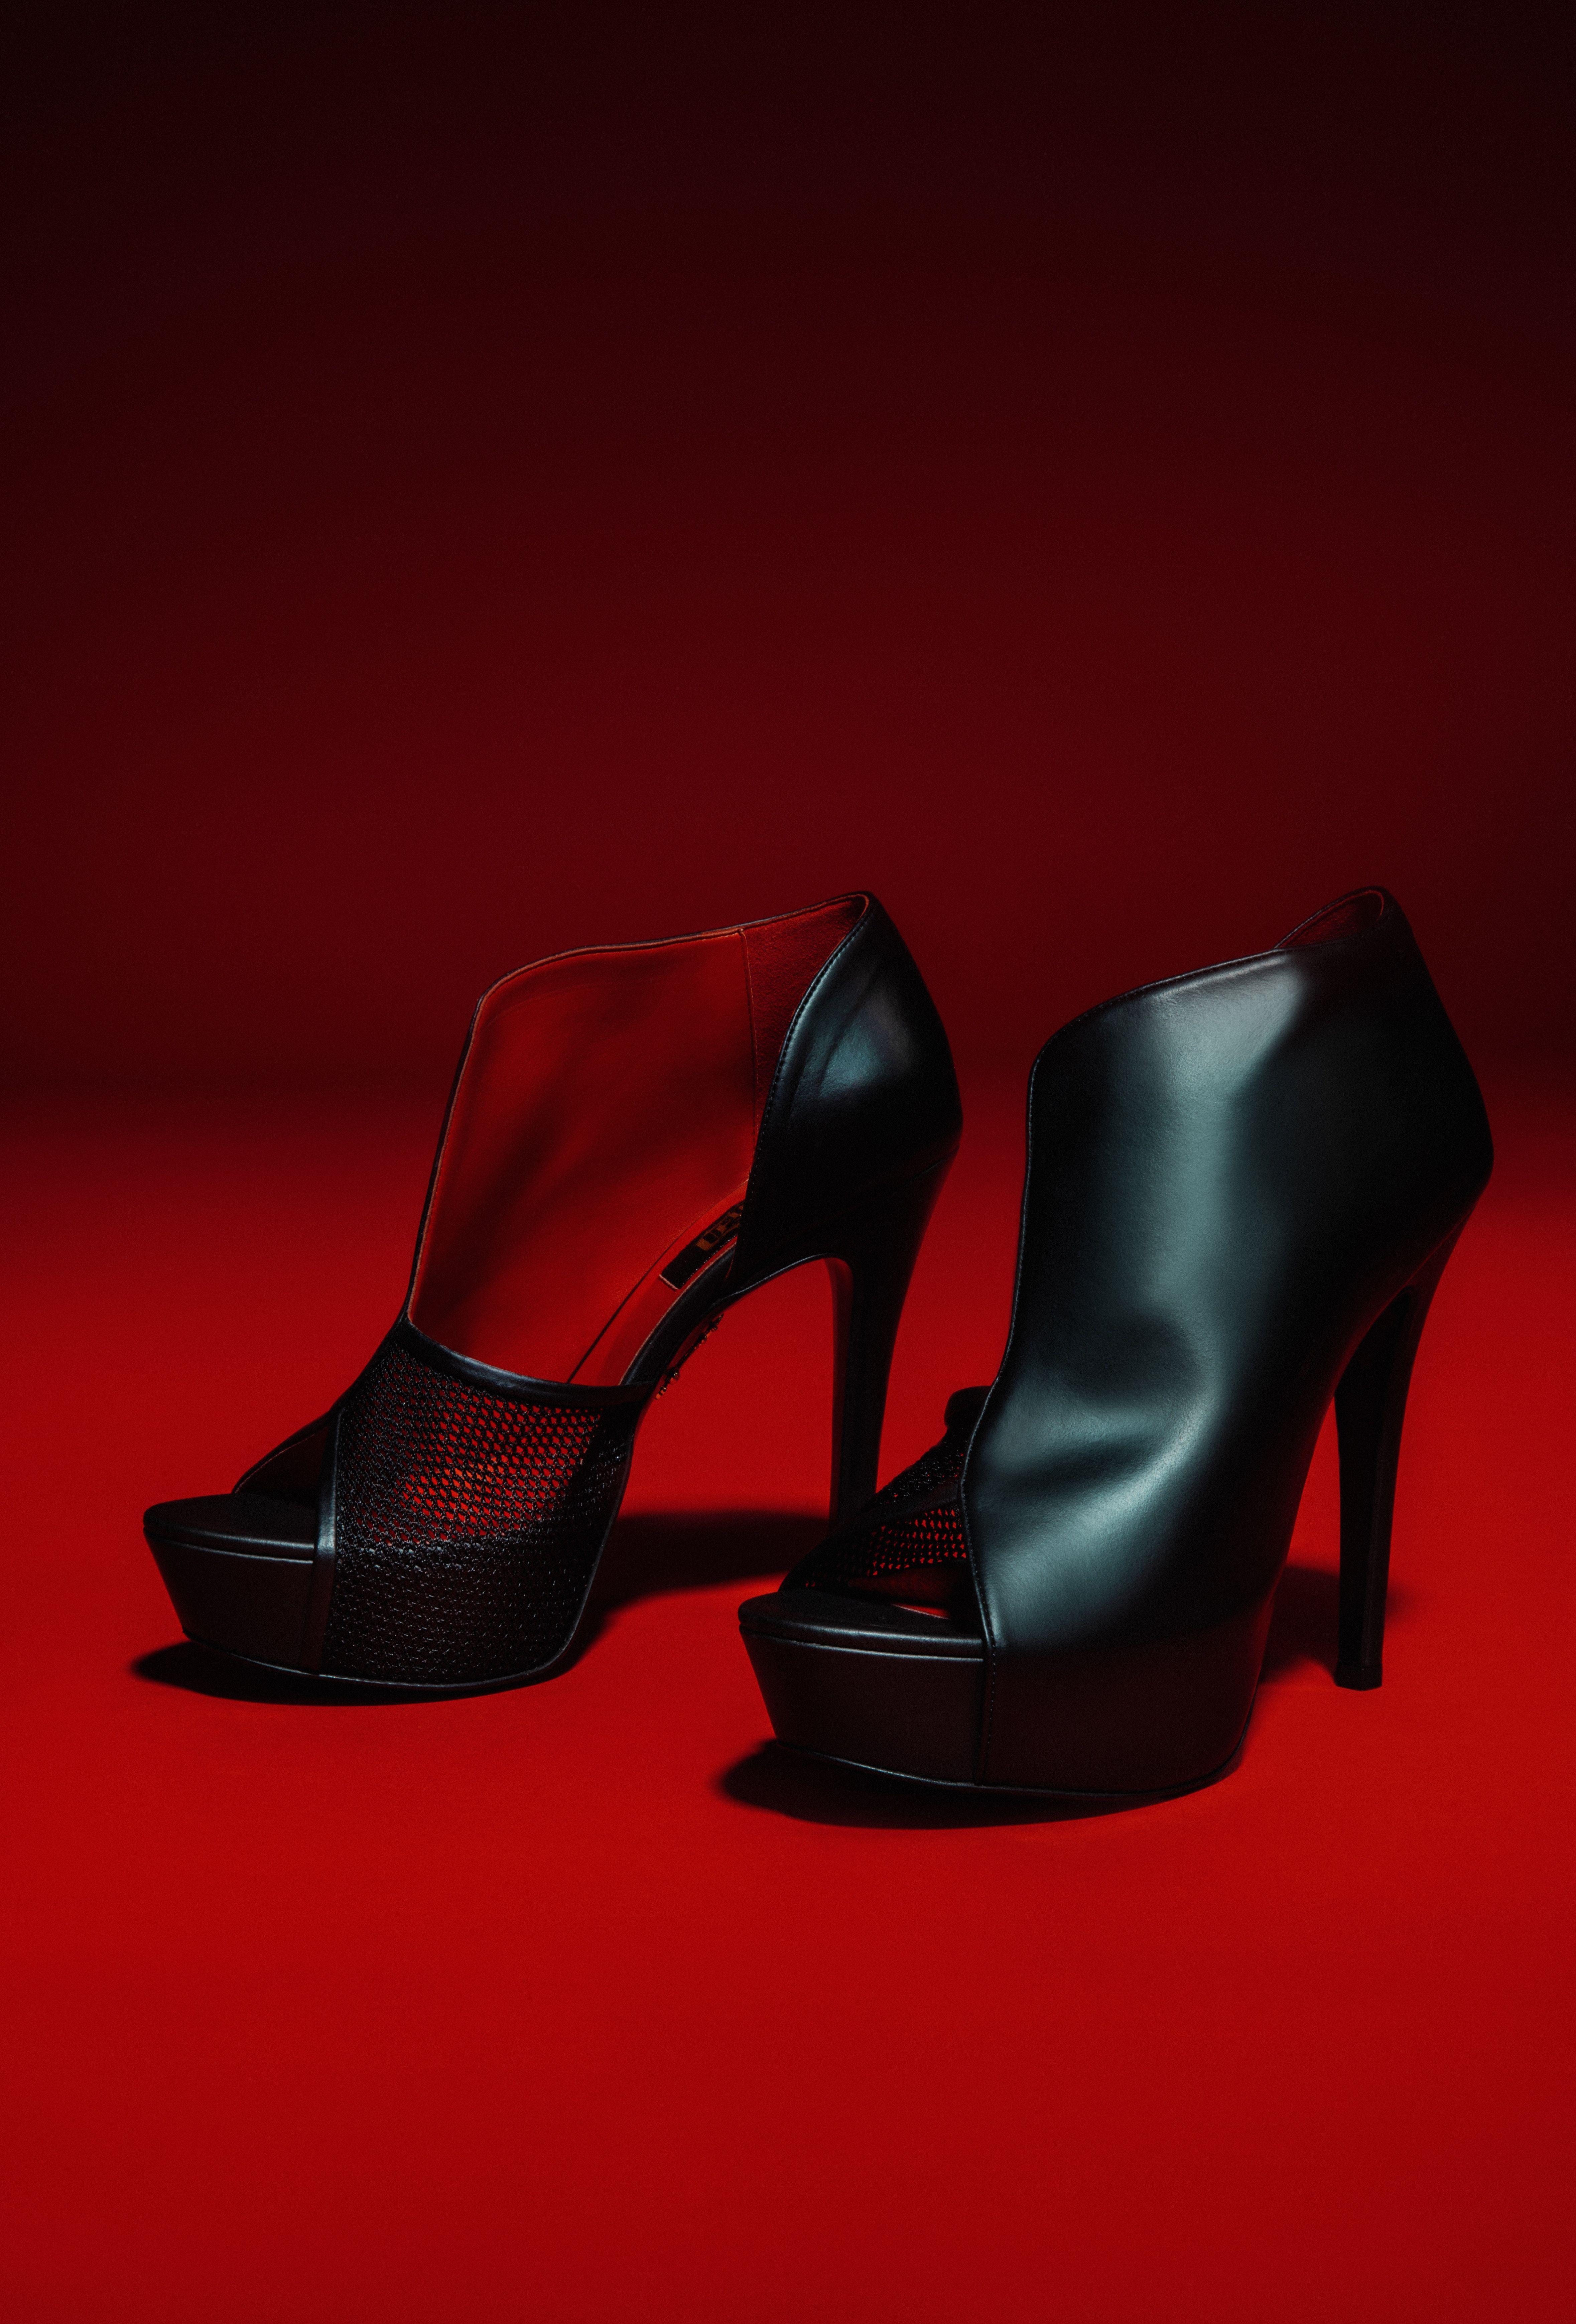 Shoes, Vegan shoes, Vegan heels